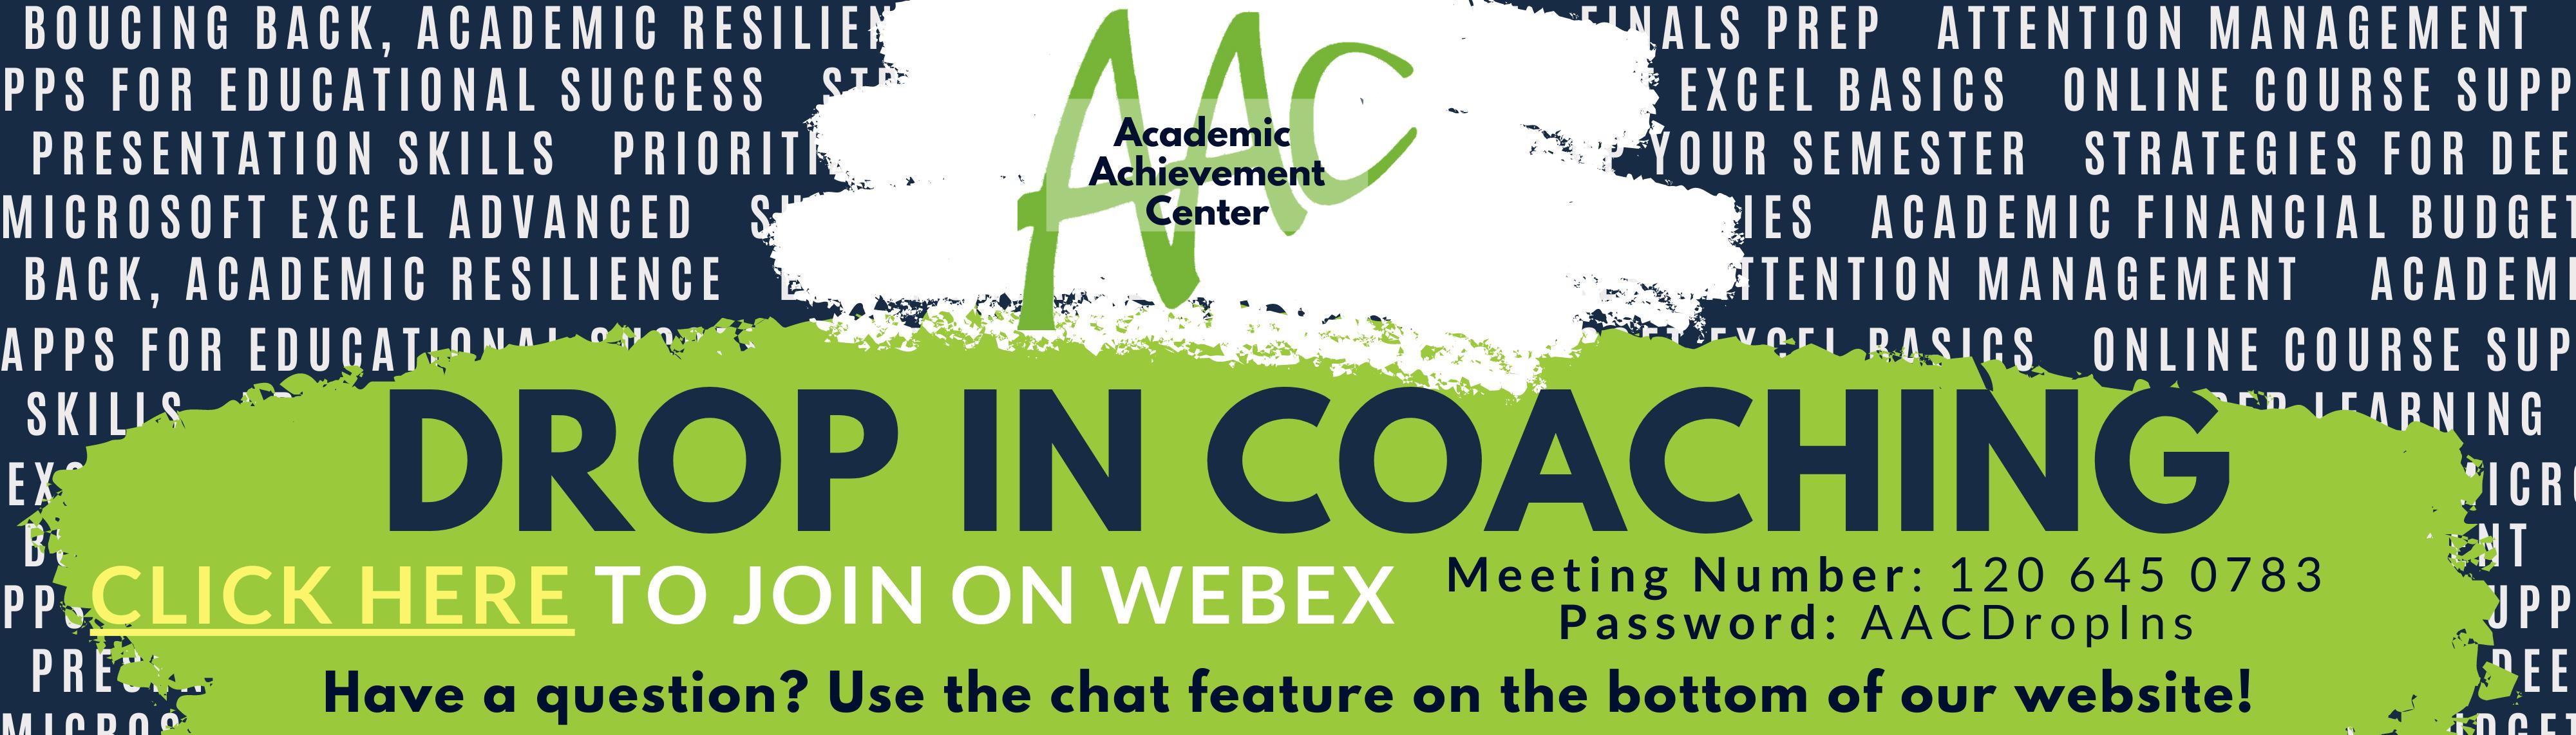 Drop In Academic Coaching - Spring 2021: https://uconnvtc.webex.com/uconnvtc/j.php?MTID=m83a8f6adf19a24ca196a4a82b9ddb915